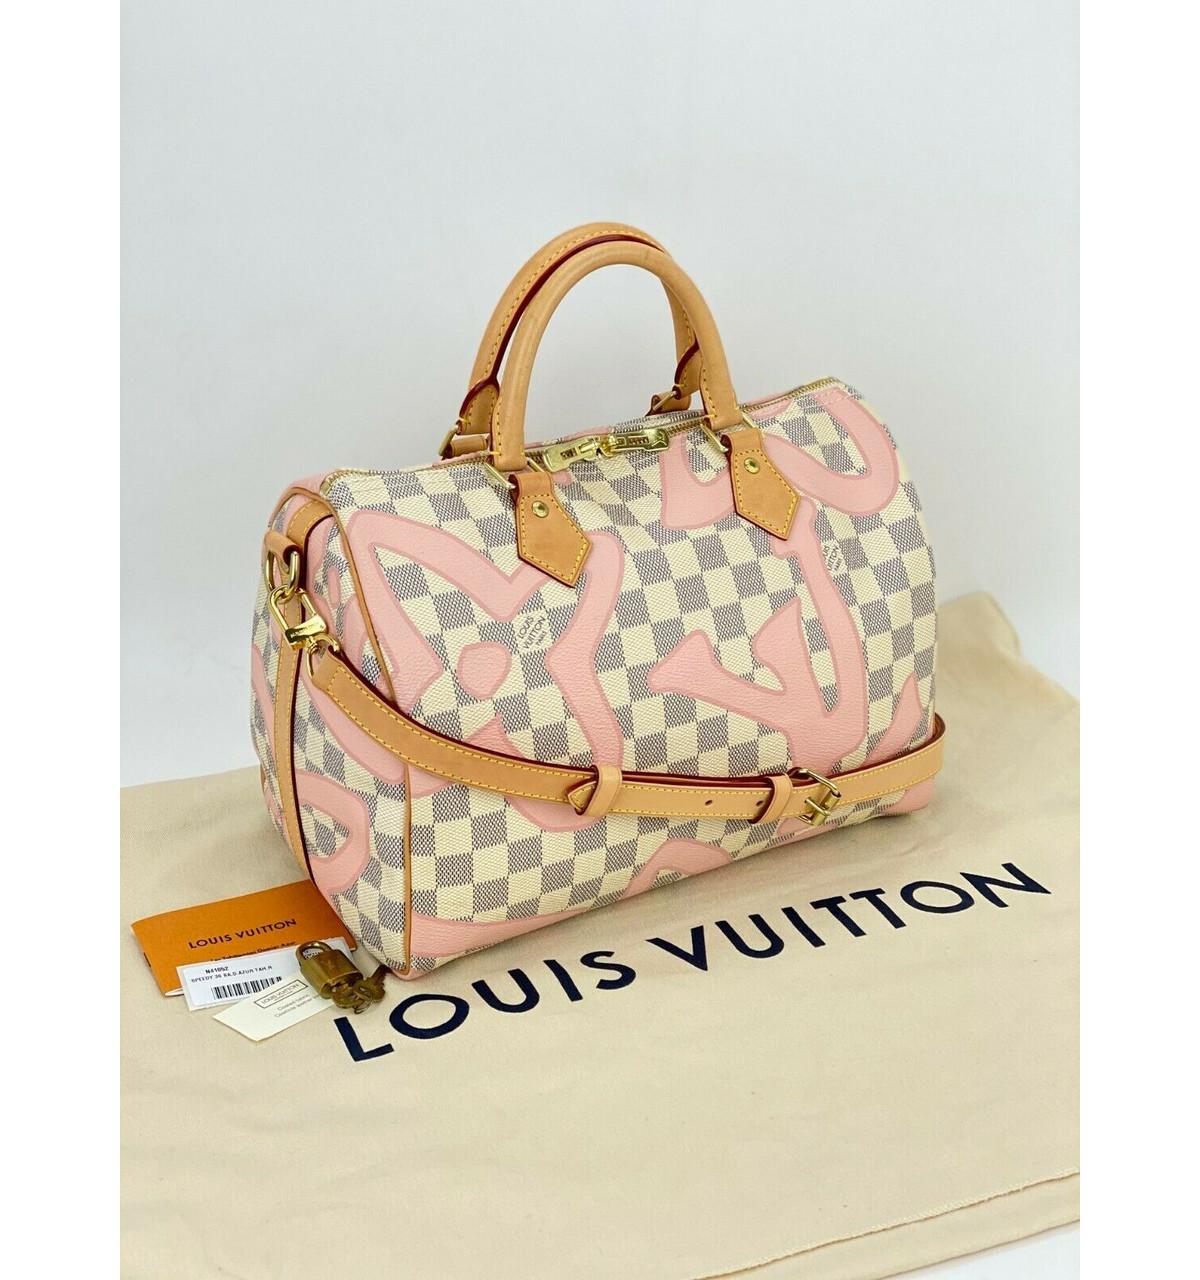 Louis Vuitton Speedy Bandouliere 12 Damier Azur Limited Edition Tahitienne  A12